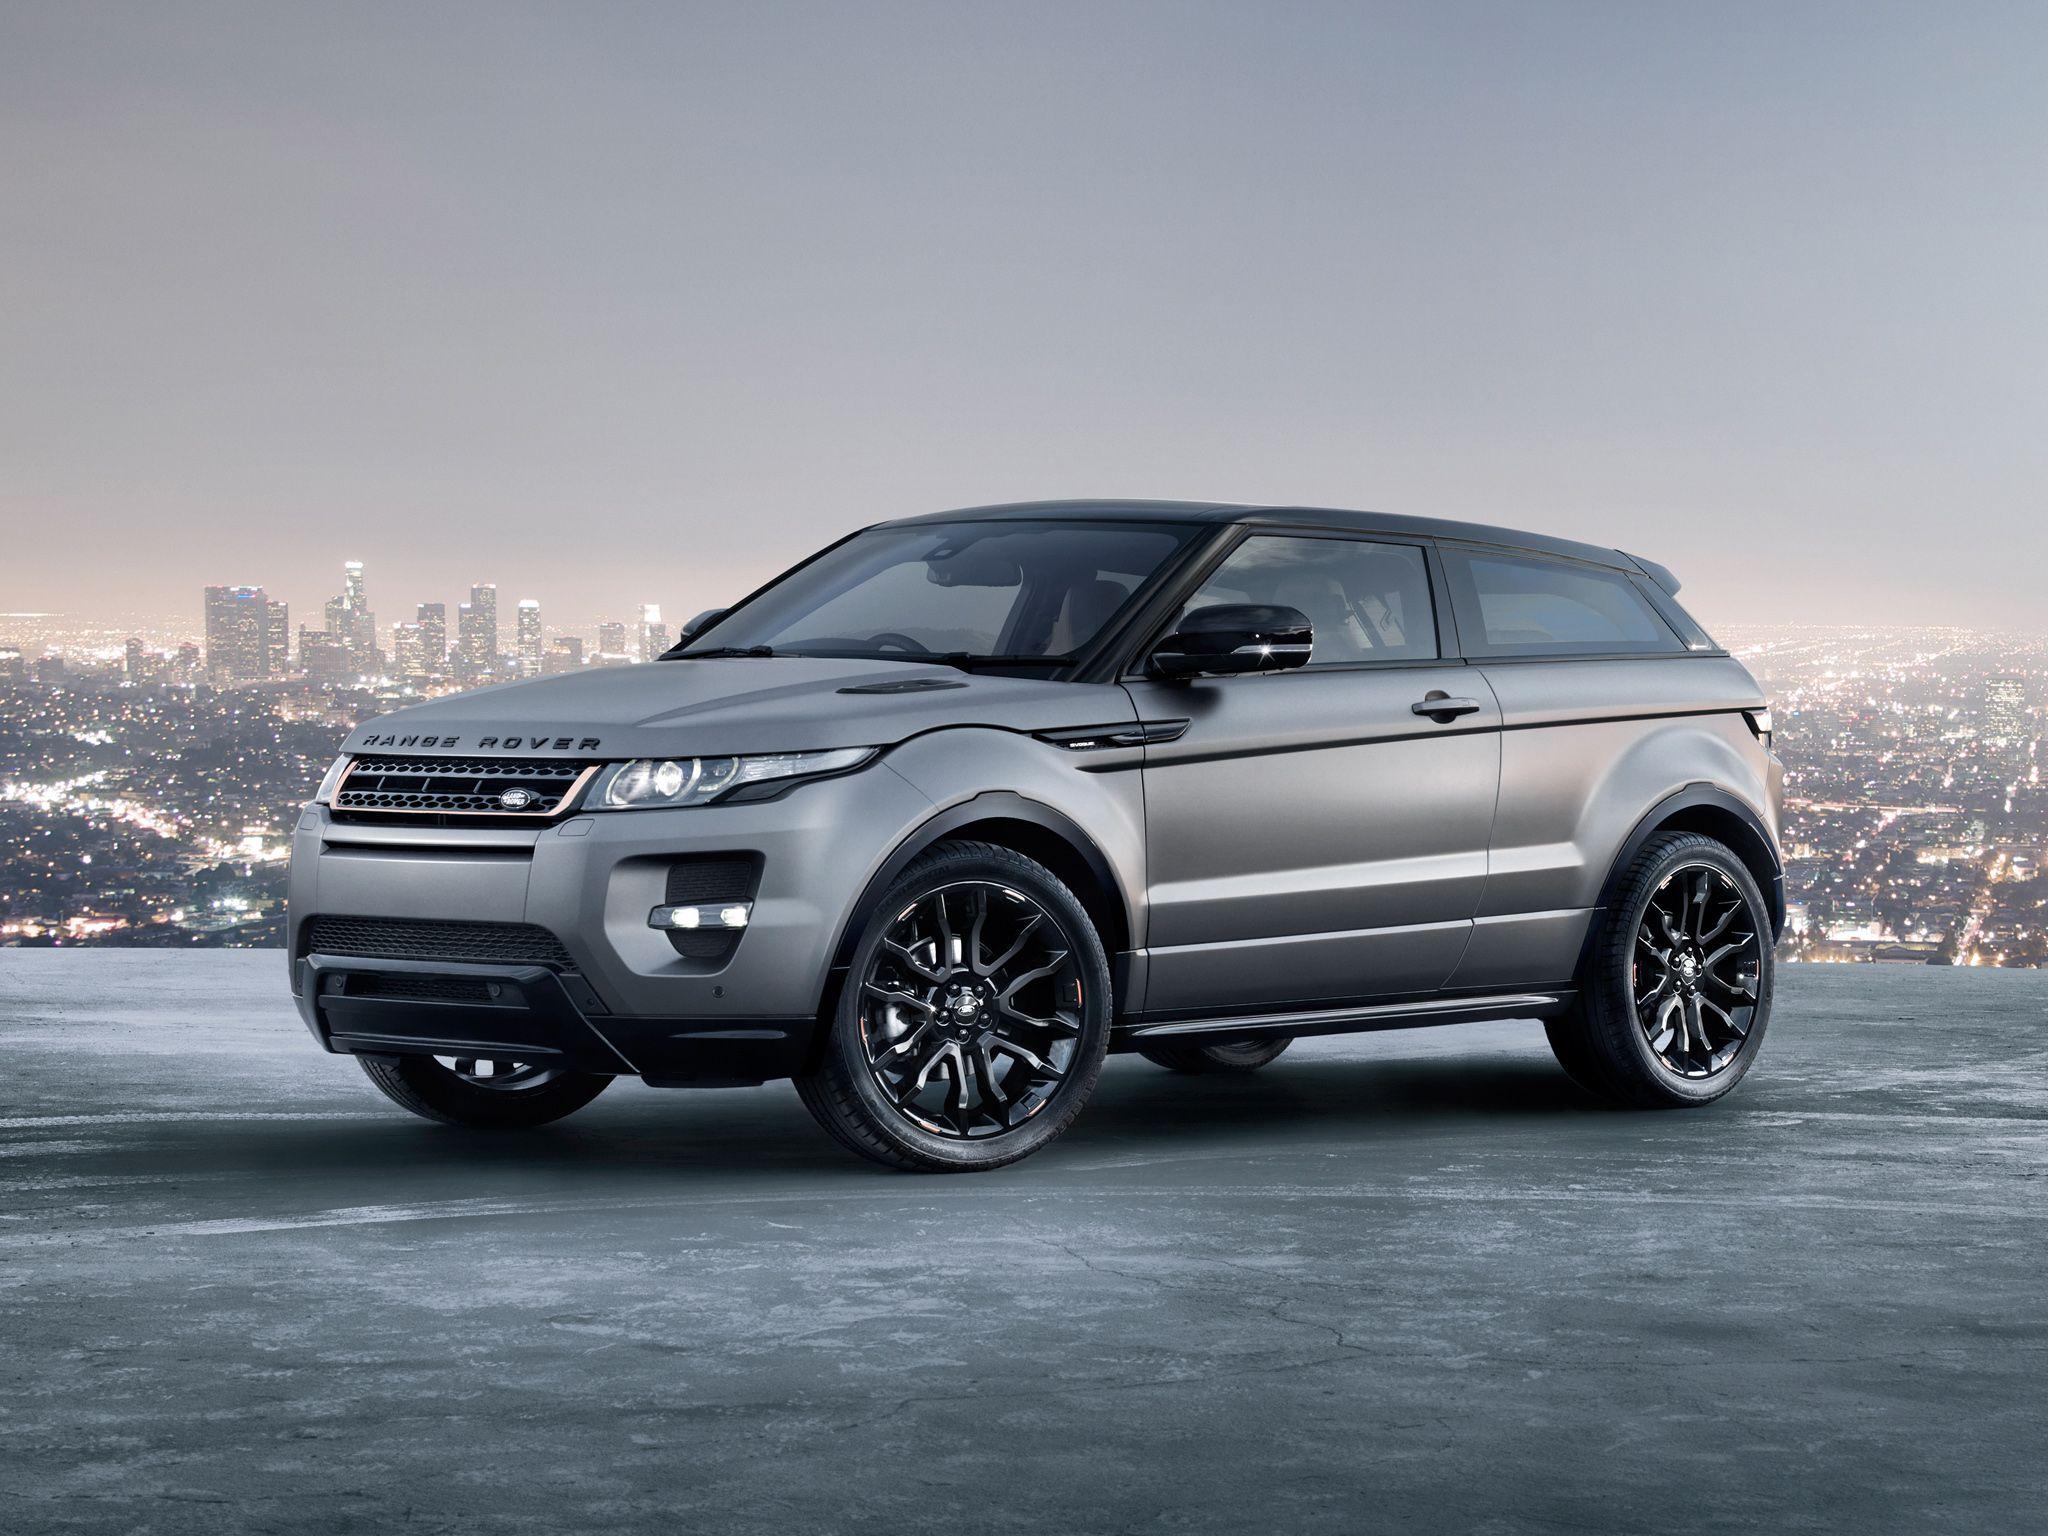 Range Rover Evoque Coupe Victoria Beckham Edition Range